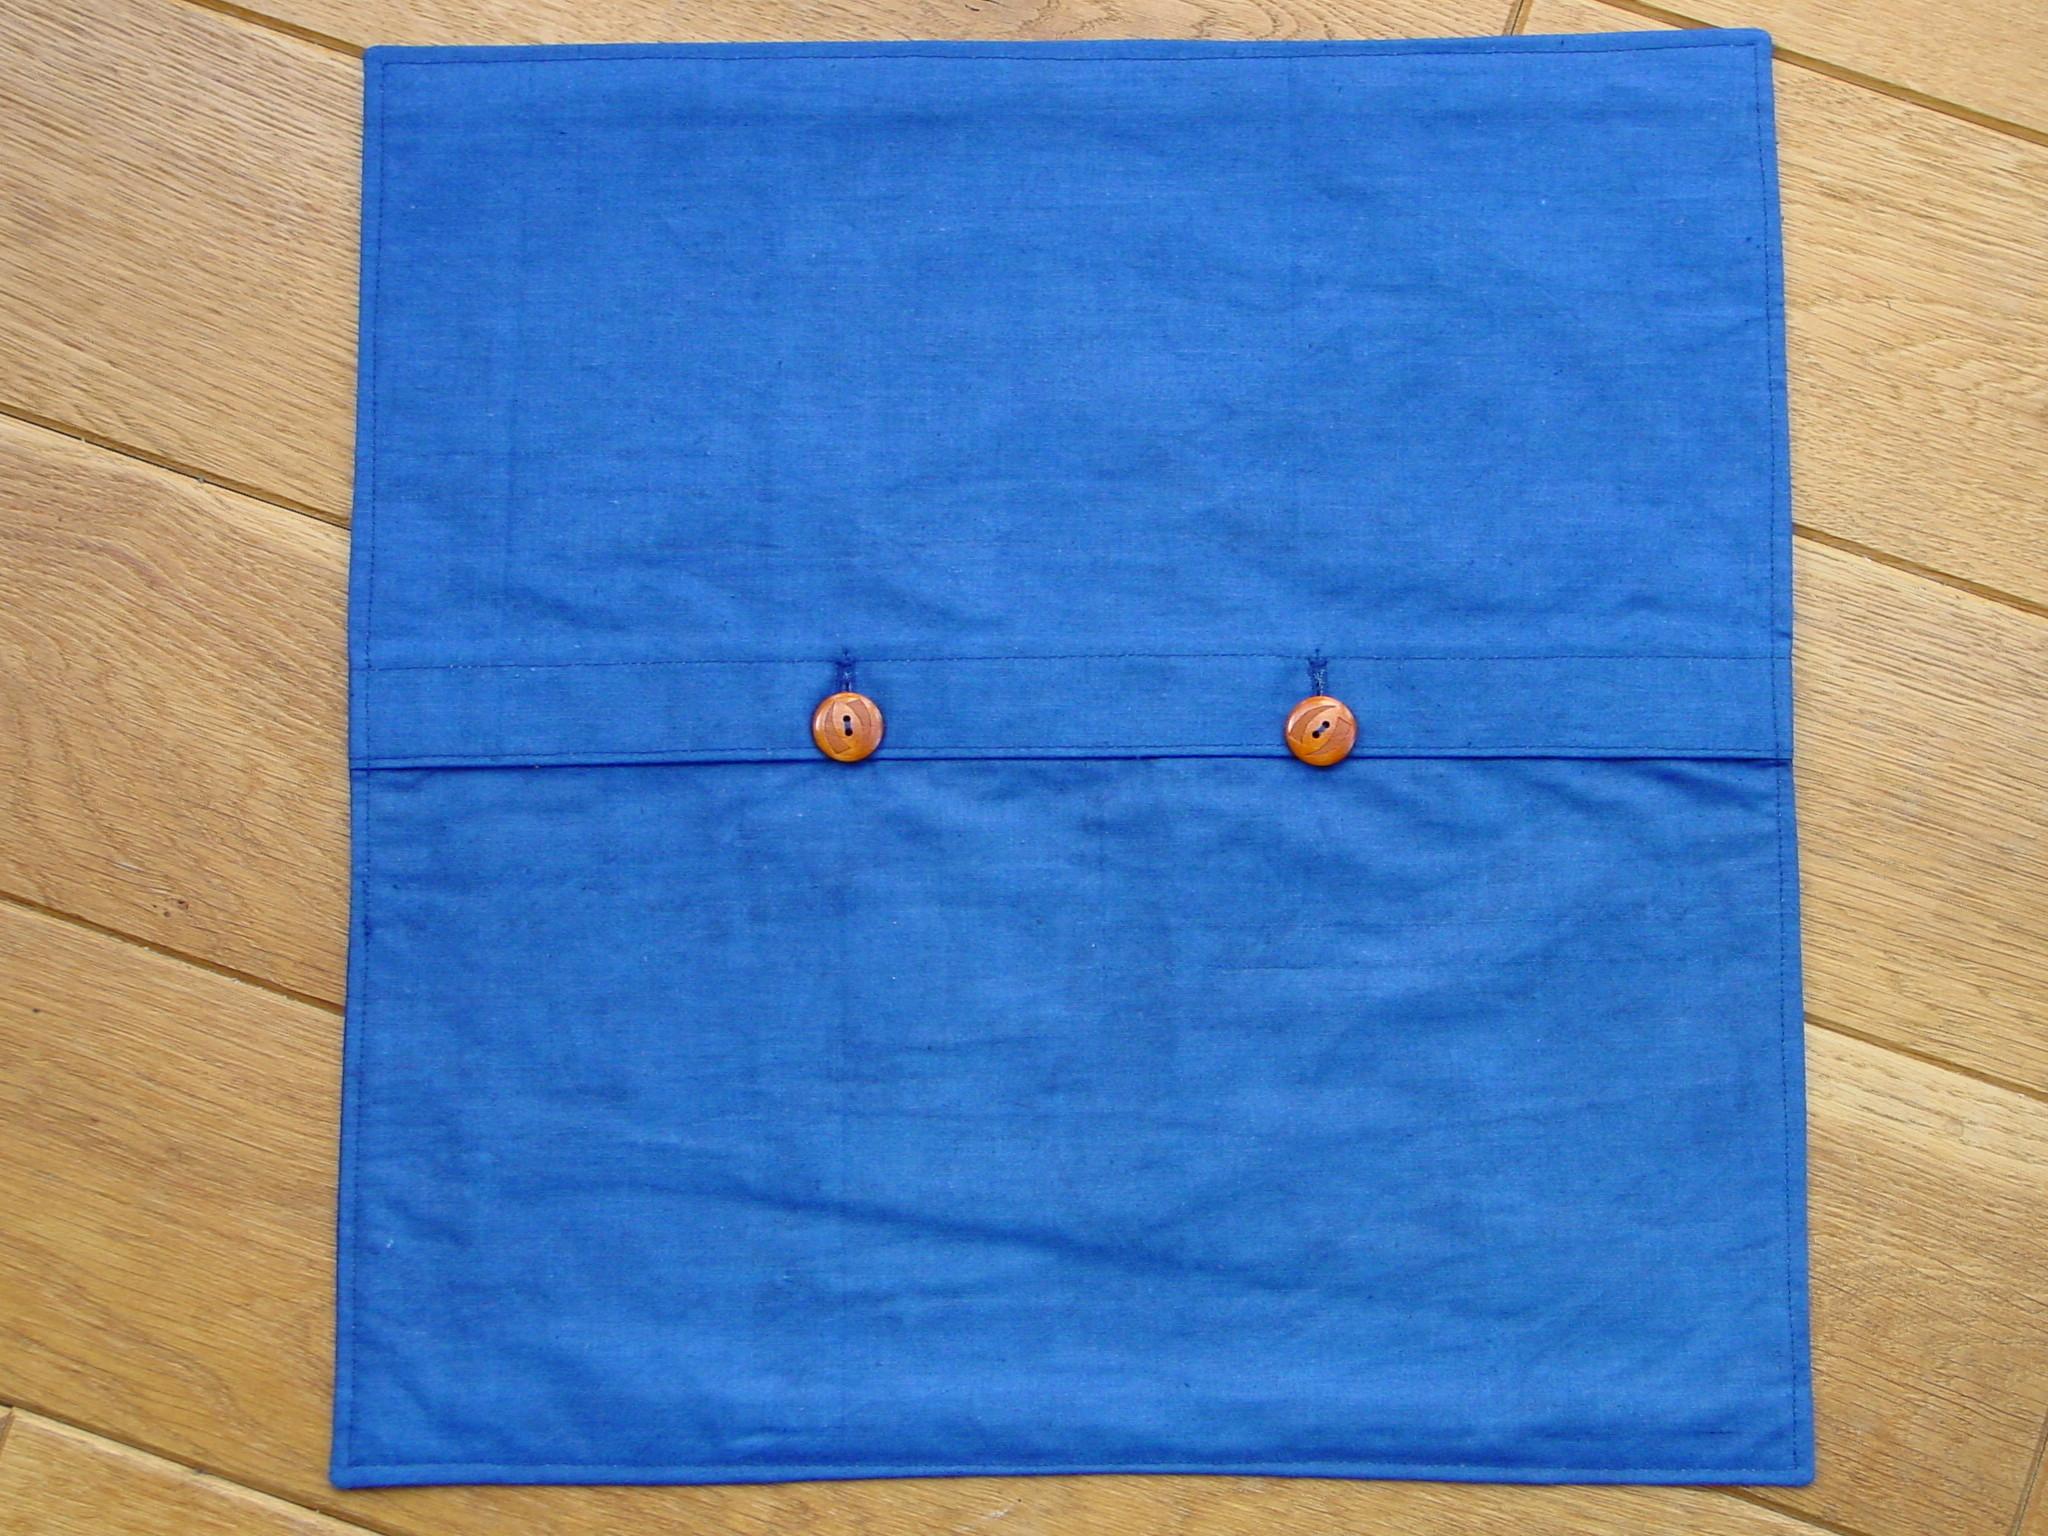 Blaudruck - Kissenbezug 7101-207